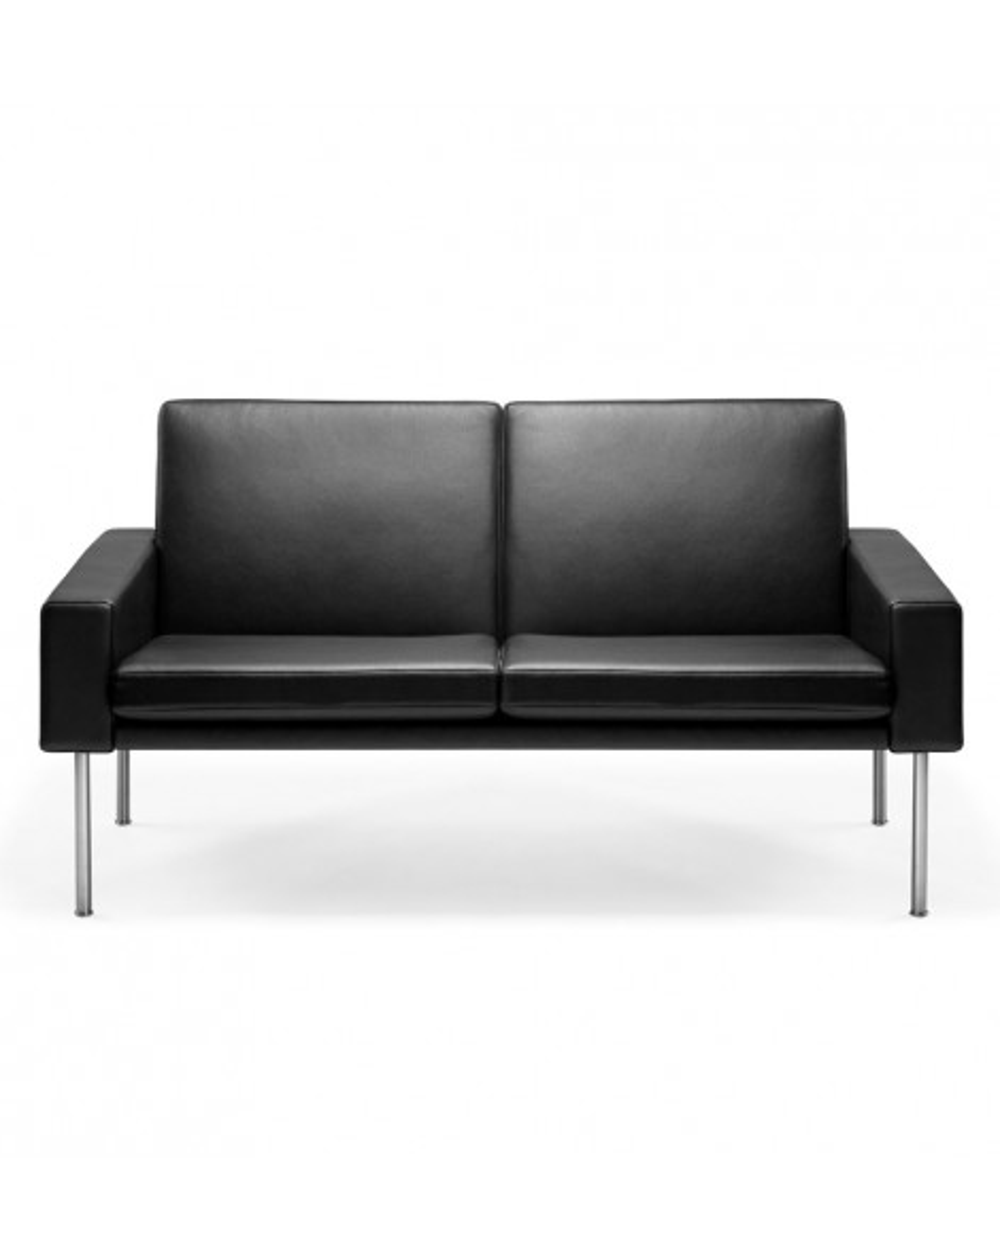 Wegner GE34 sofa, Hans J. Wegner